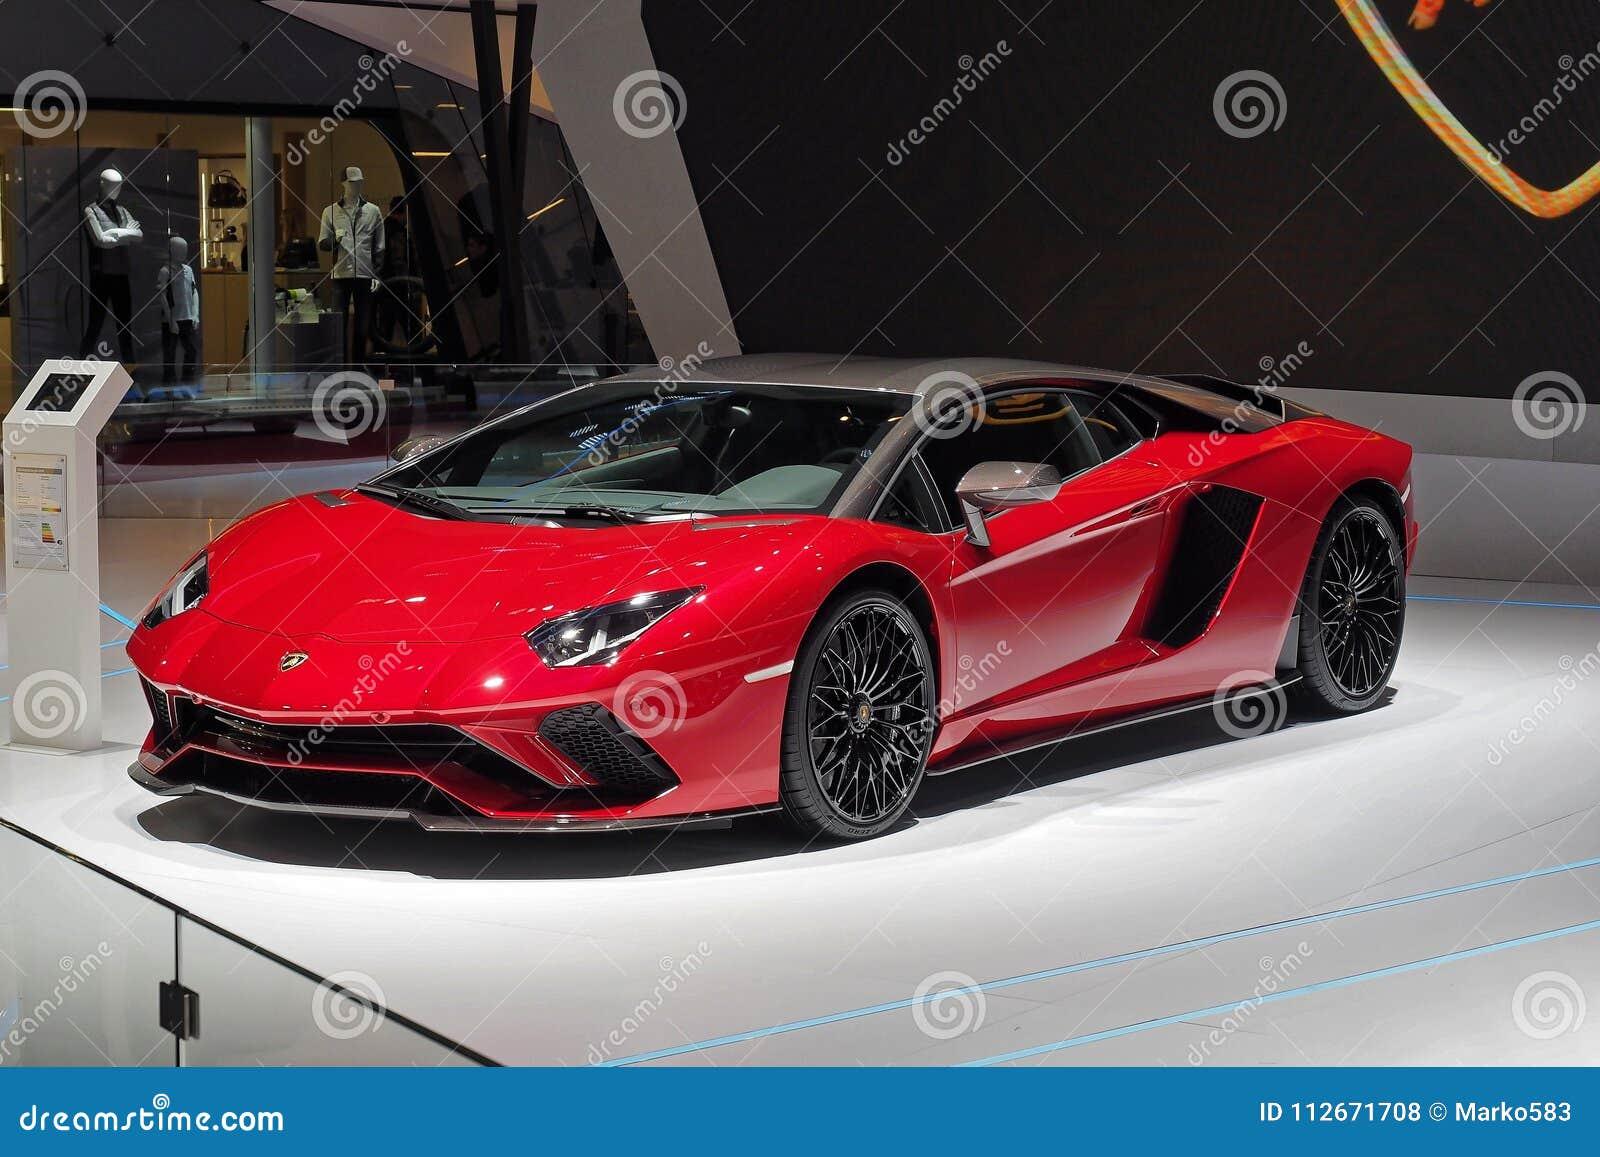 88th Geneva International Motor Show 2018 Lamborghini Aventador Sv Editorial Stock Photo Image Of Mortorshow 88th 112671708